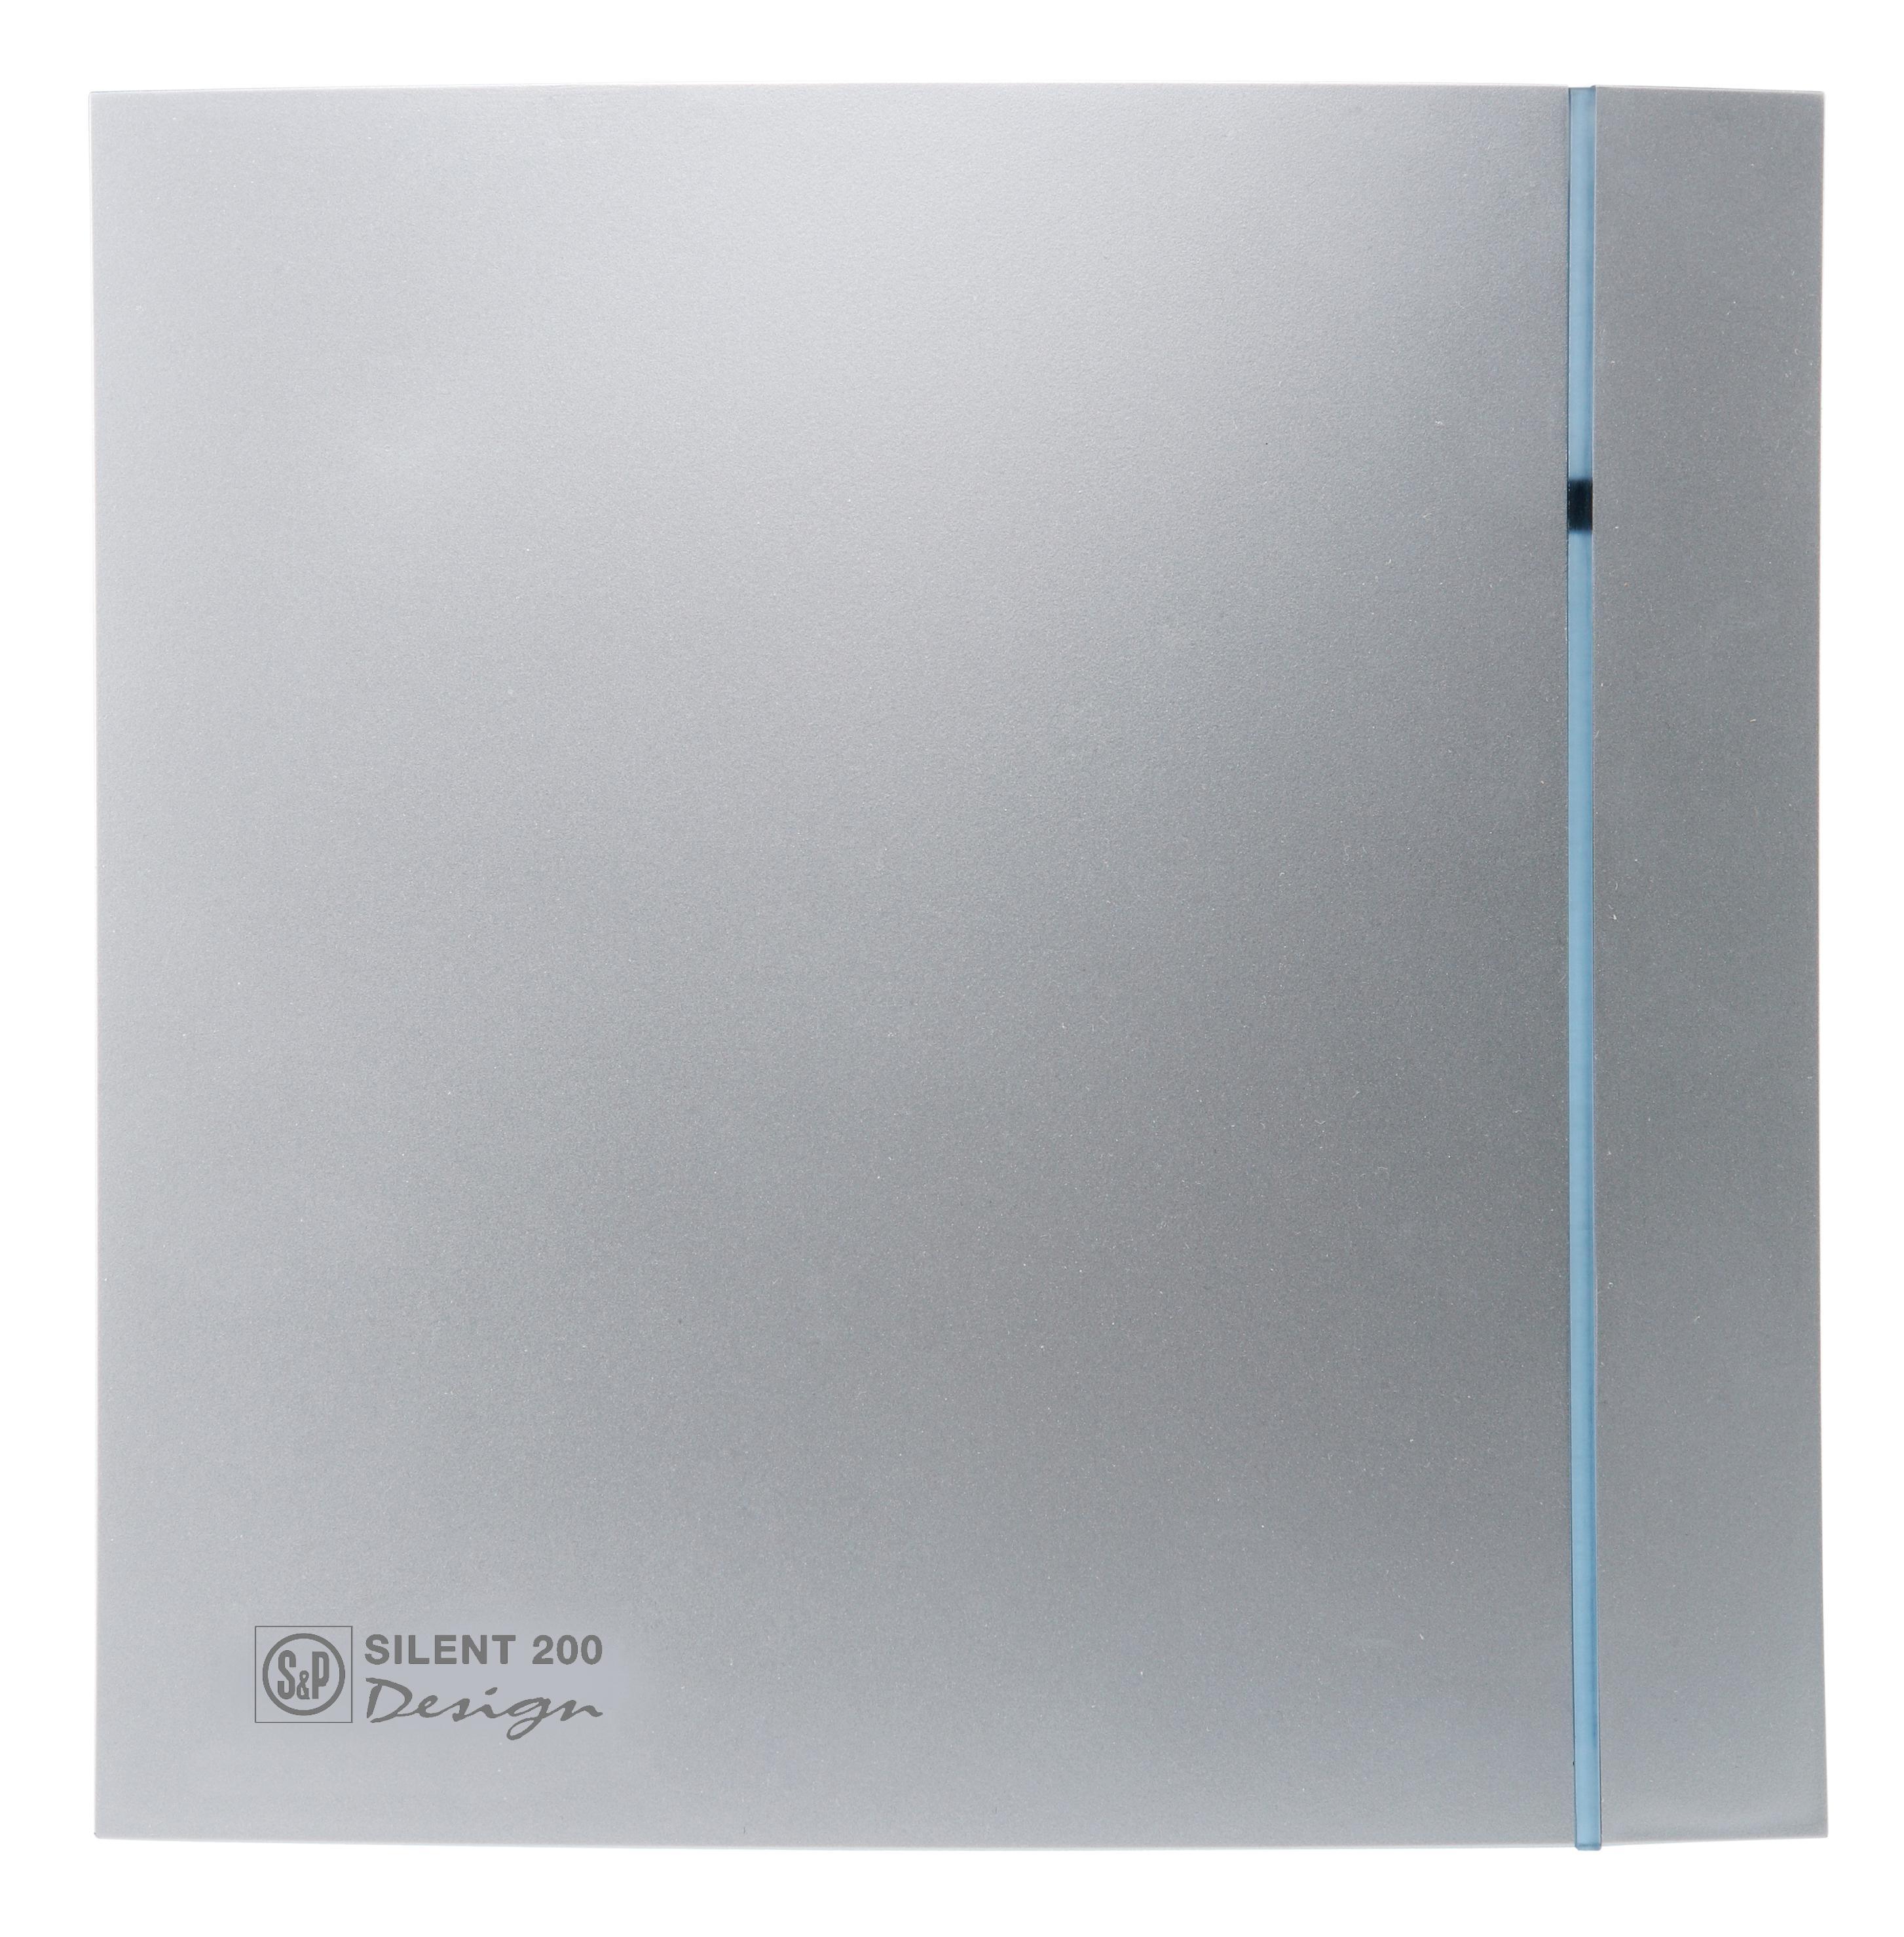 Вентилятор Soler&palau Silent-200 chz silver design-3c palau кухня palau baby glo 89 см арт 20005